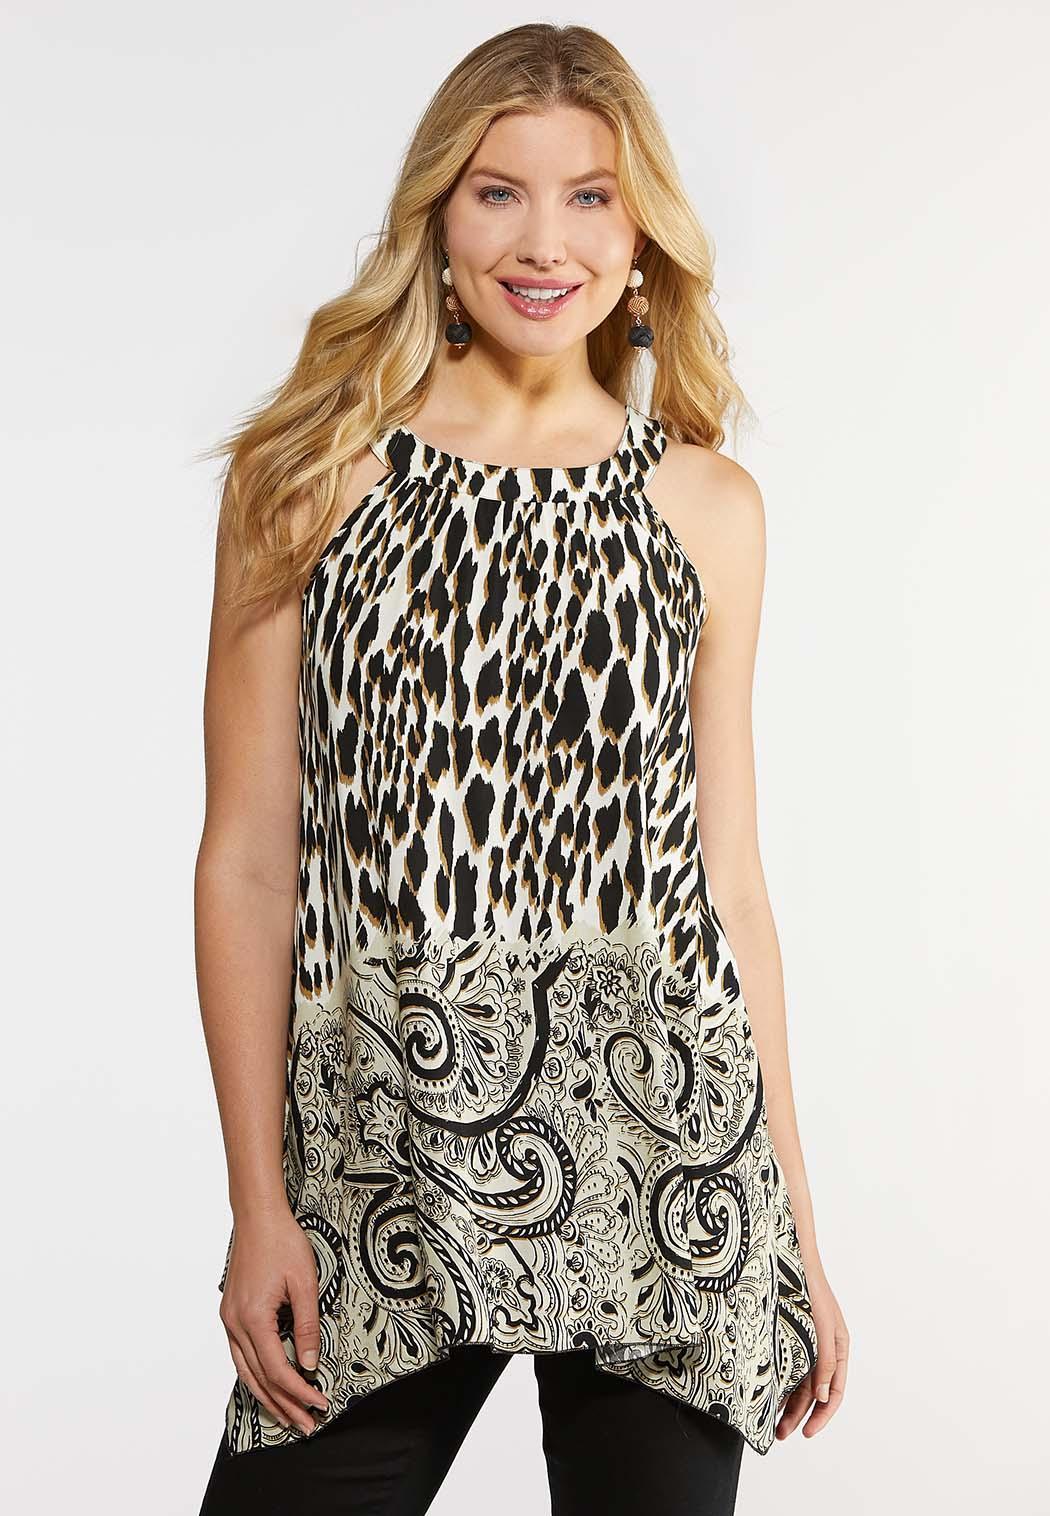 69626c40950eca Plus Size Cleo Animal Paisley Tank Shirts & Blouses Cato Fashions